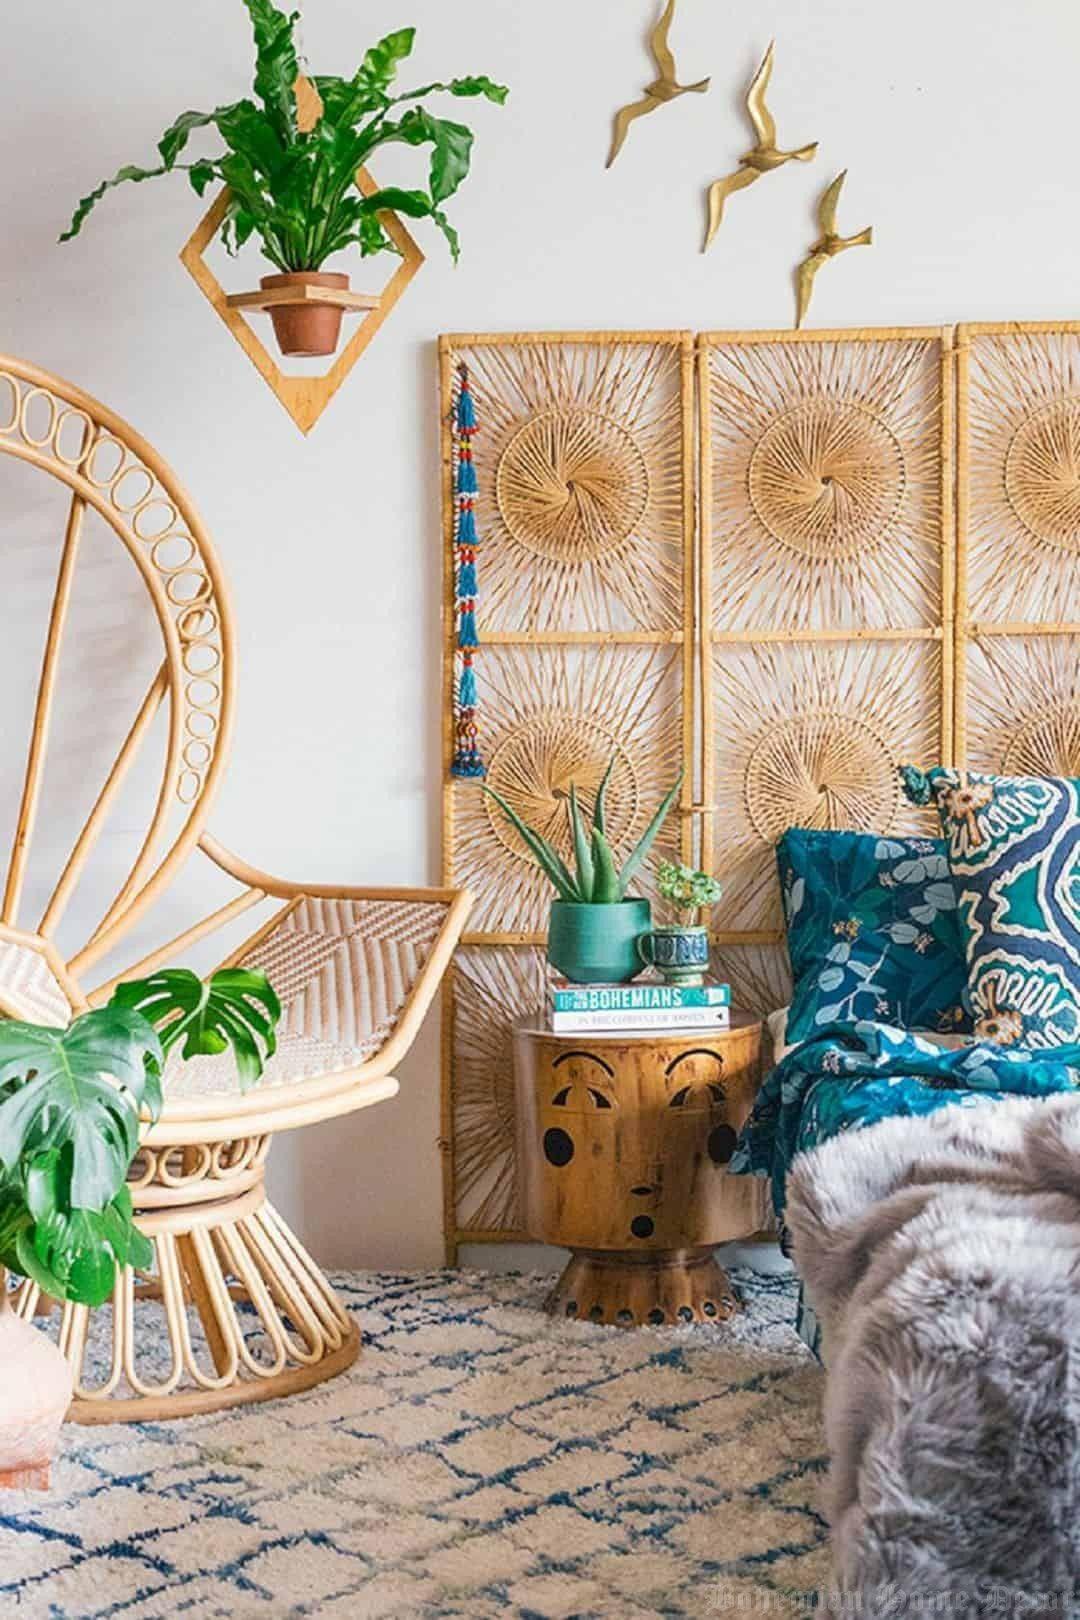 Should Fixing Bohemian Home Decor Take 60 Steps?